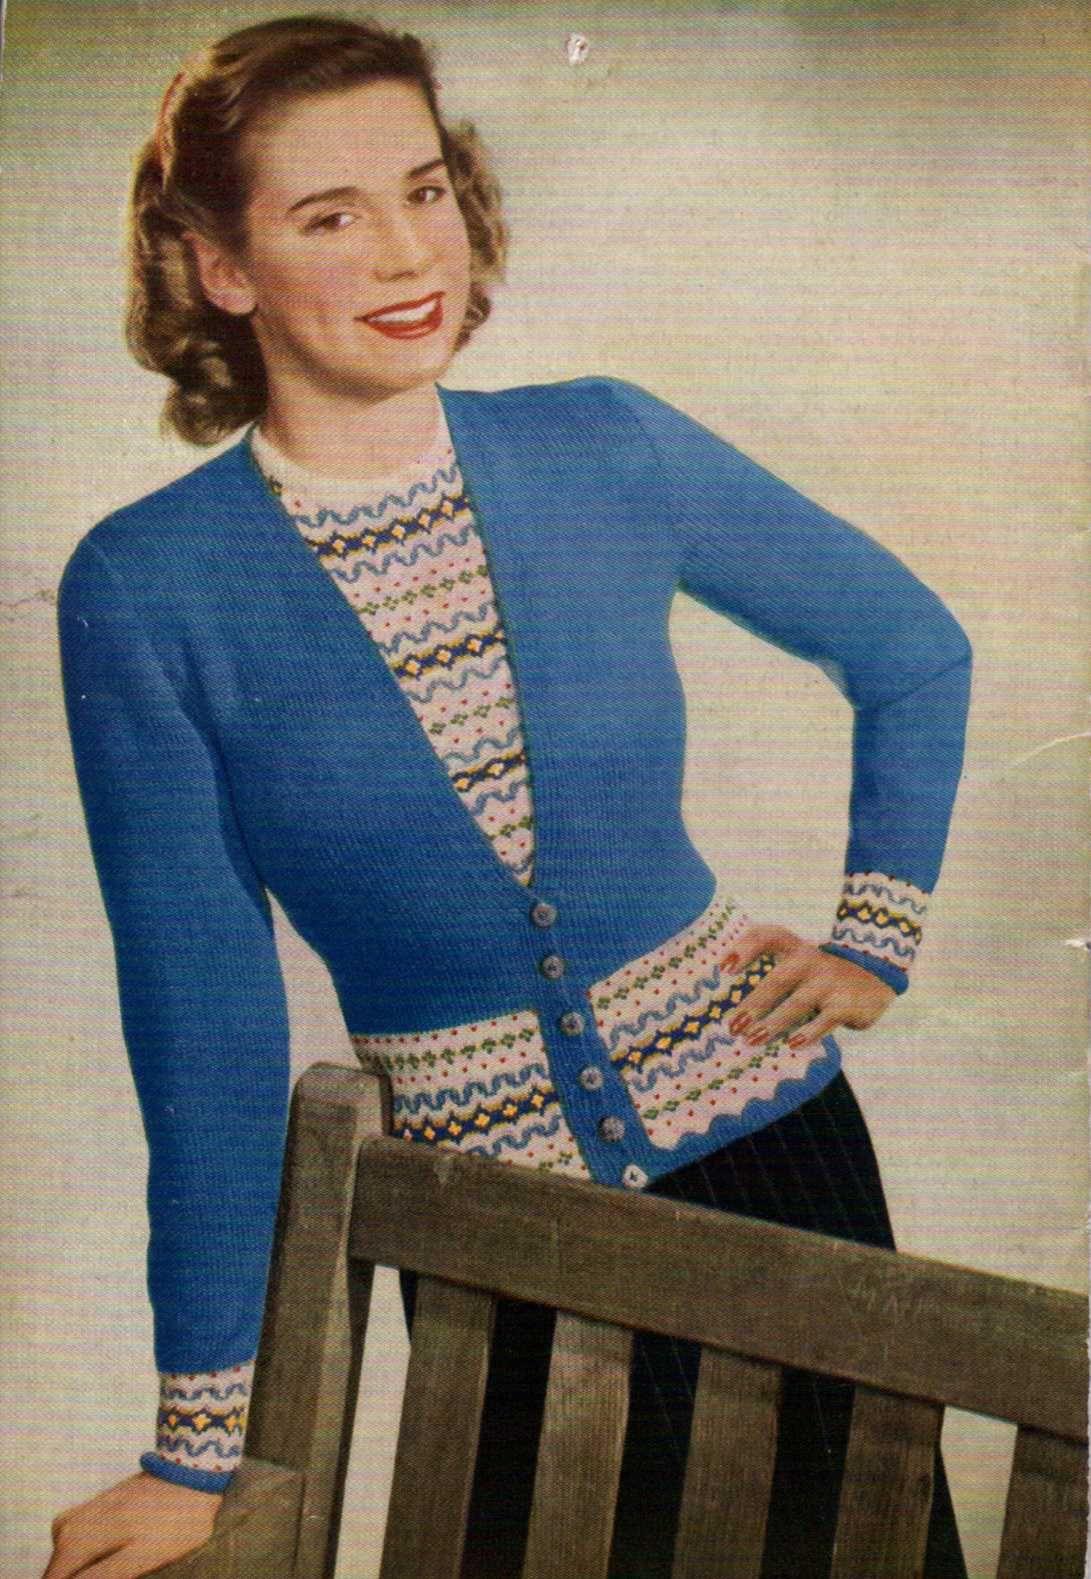 f3b424e9681e Free Vintage Knitting Pattern  Twin Set from The Stitchcraft Twin ...